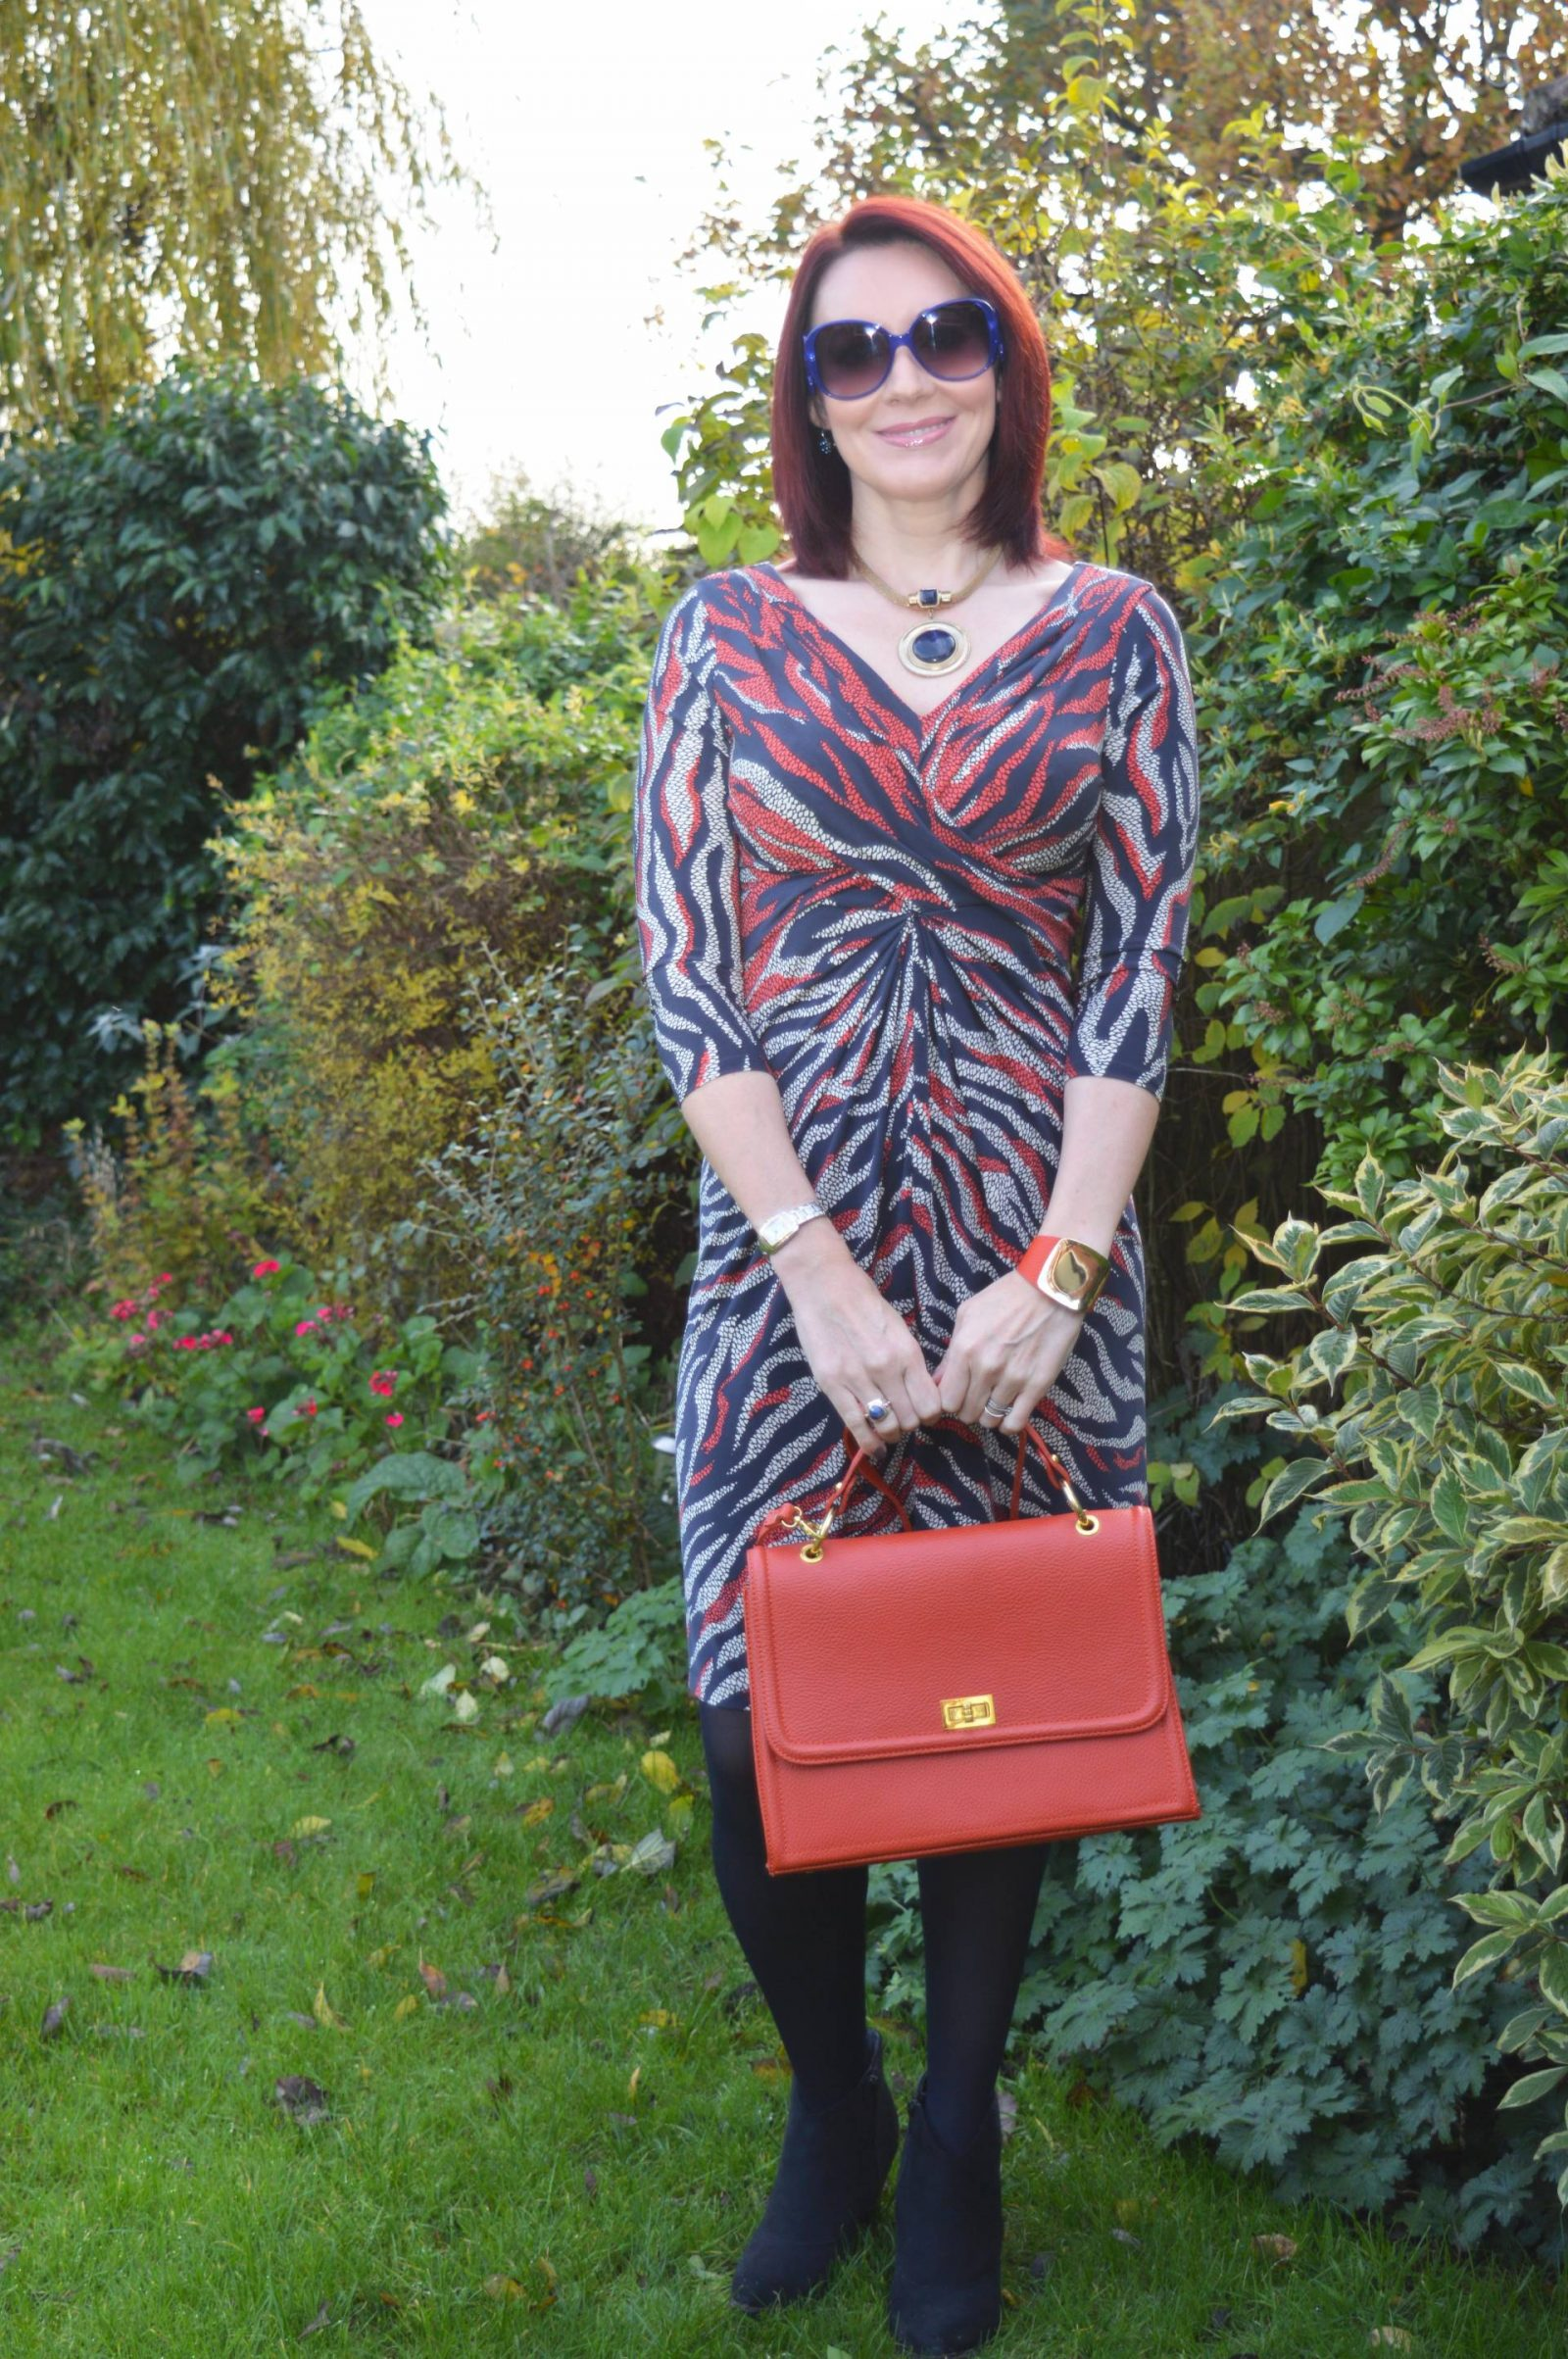 Anne Klein Dress for Less Than a Fiver orange leather bag